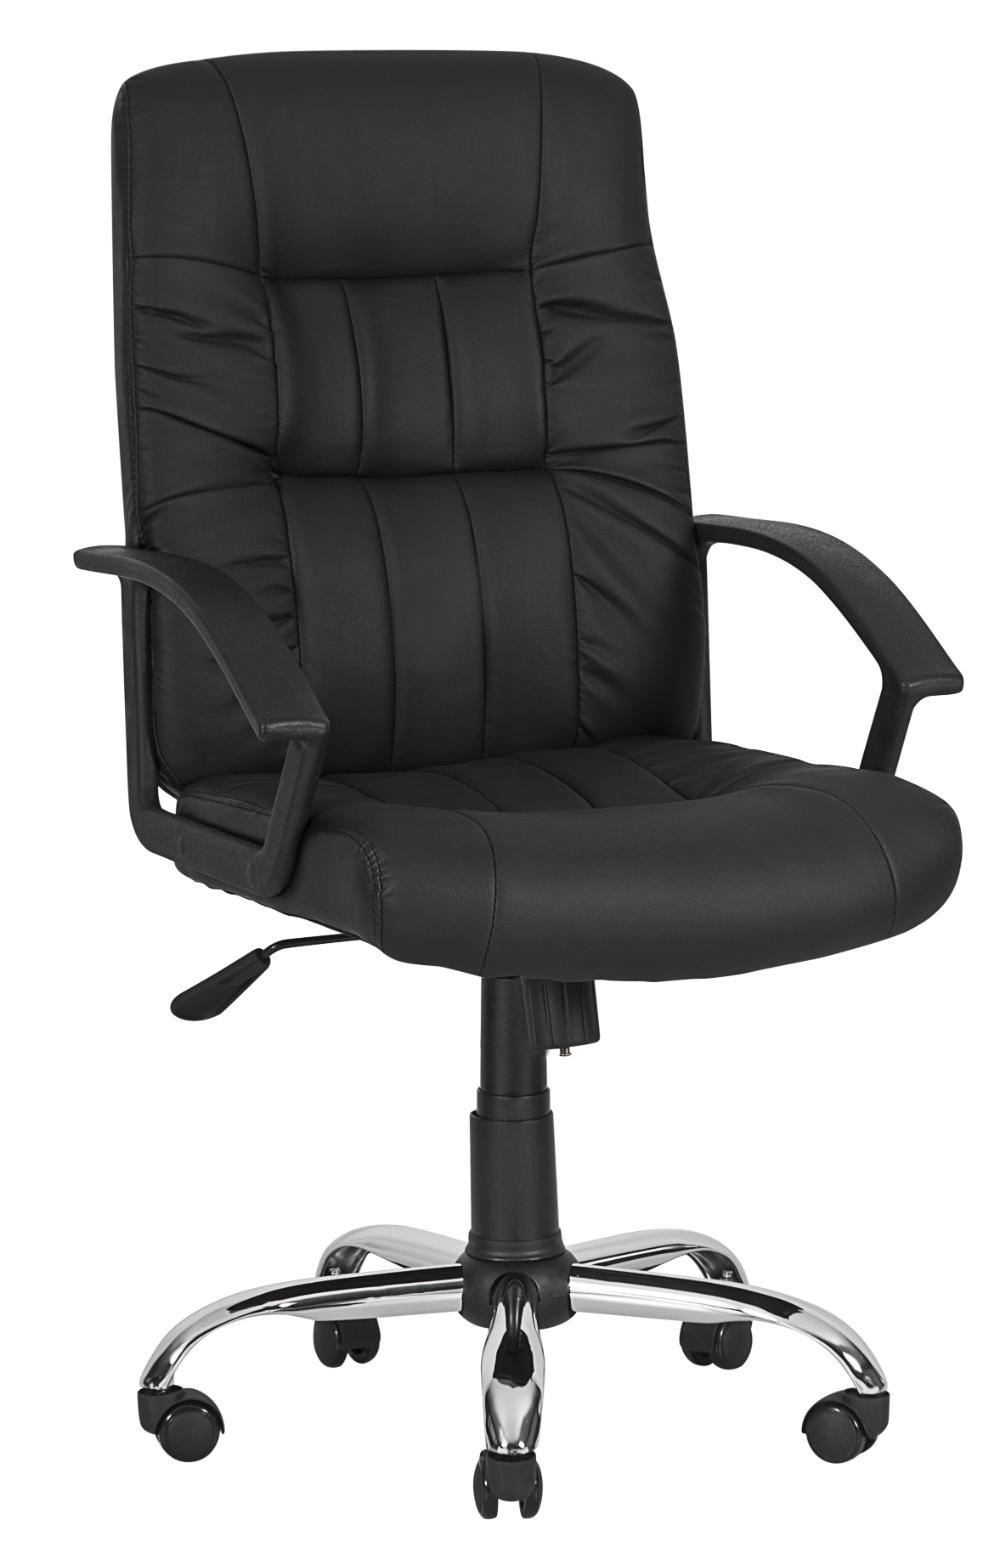 Gerenciales muebles para oficinas for Silla giratoria ergonomica